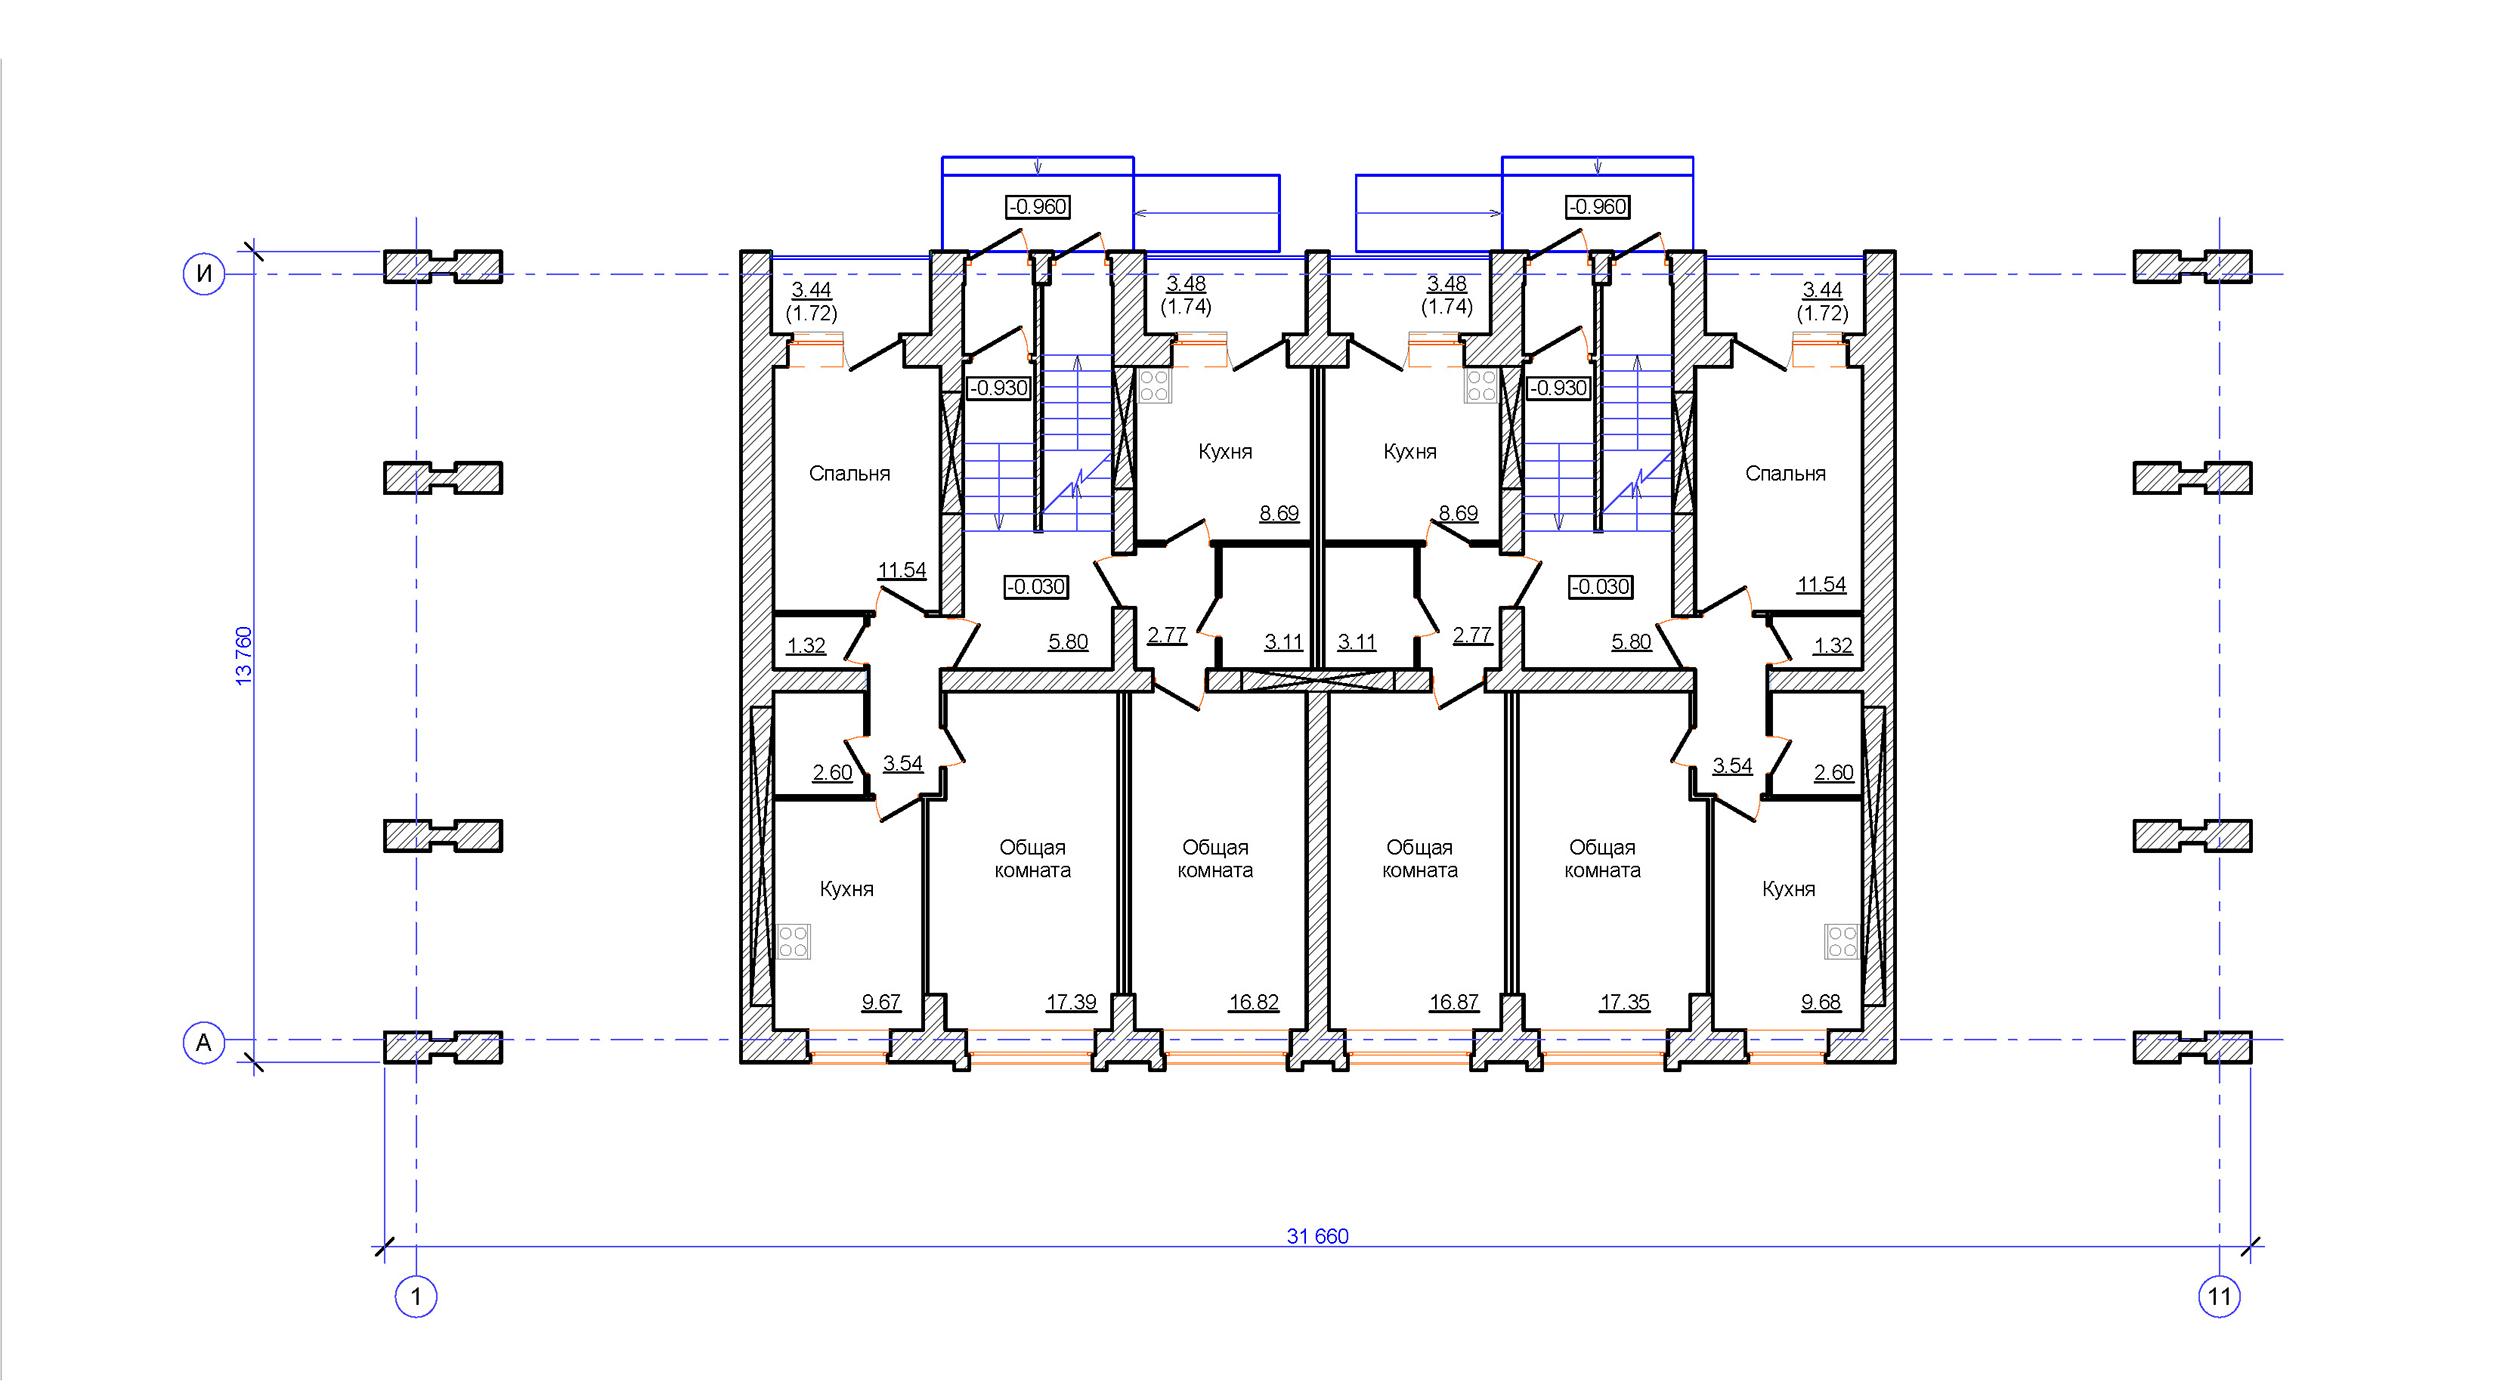 Проект 3-х этажного многоквартирного дома. План на отм. 0.000